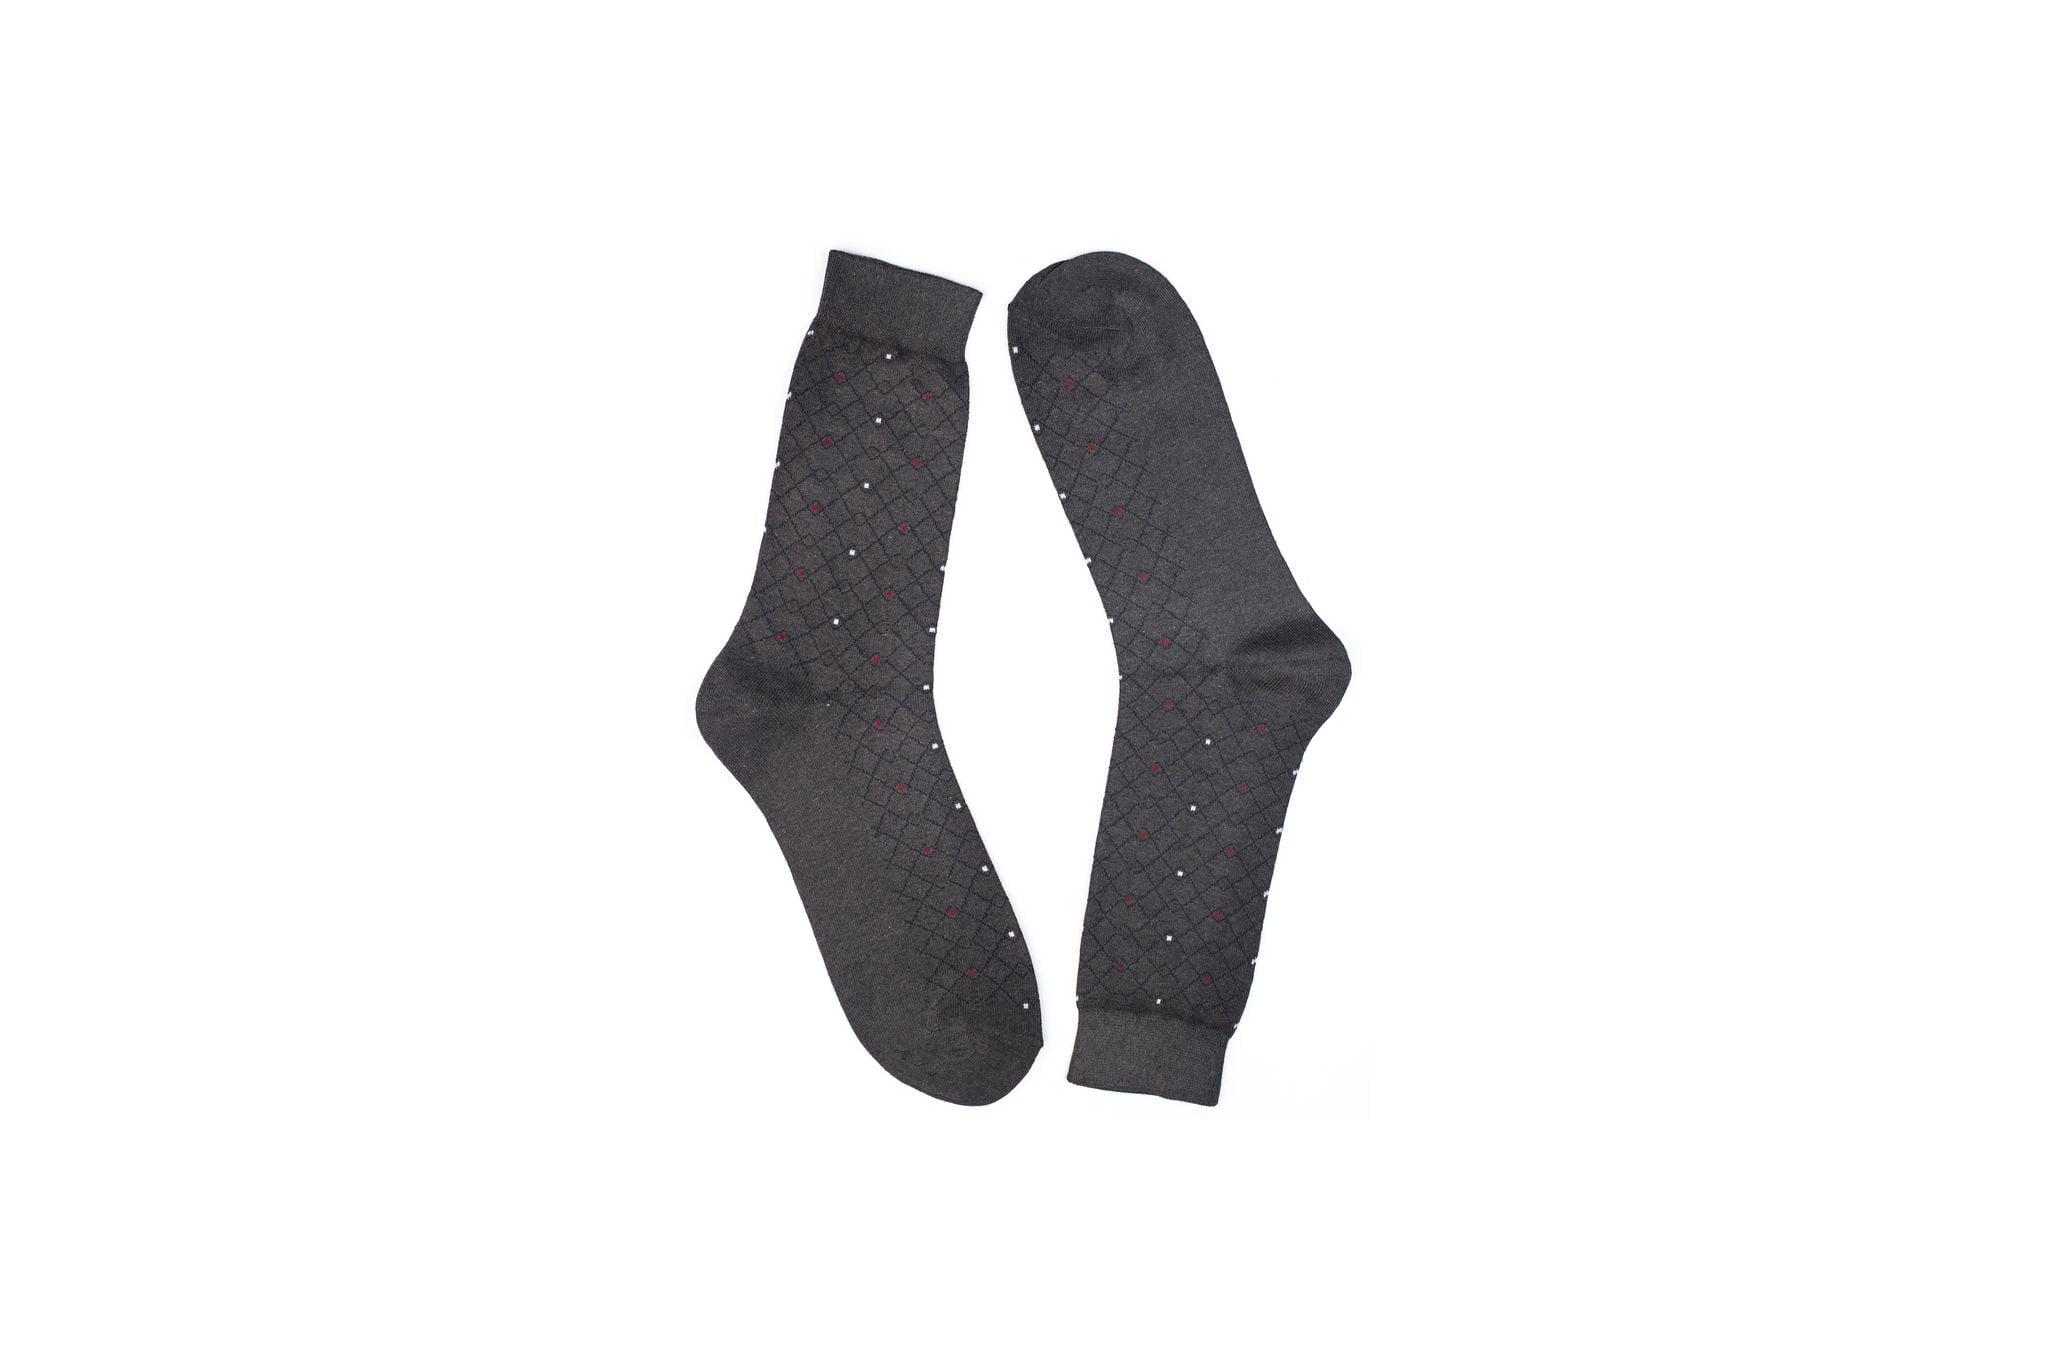 Moody Socks trial 1-458